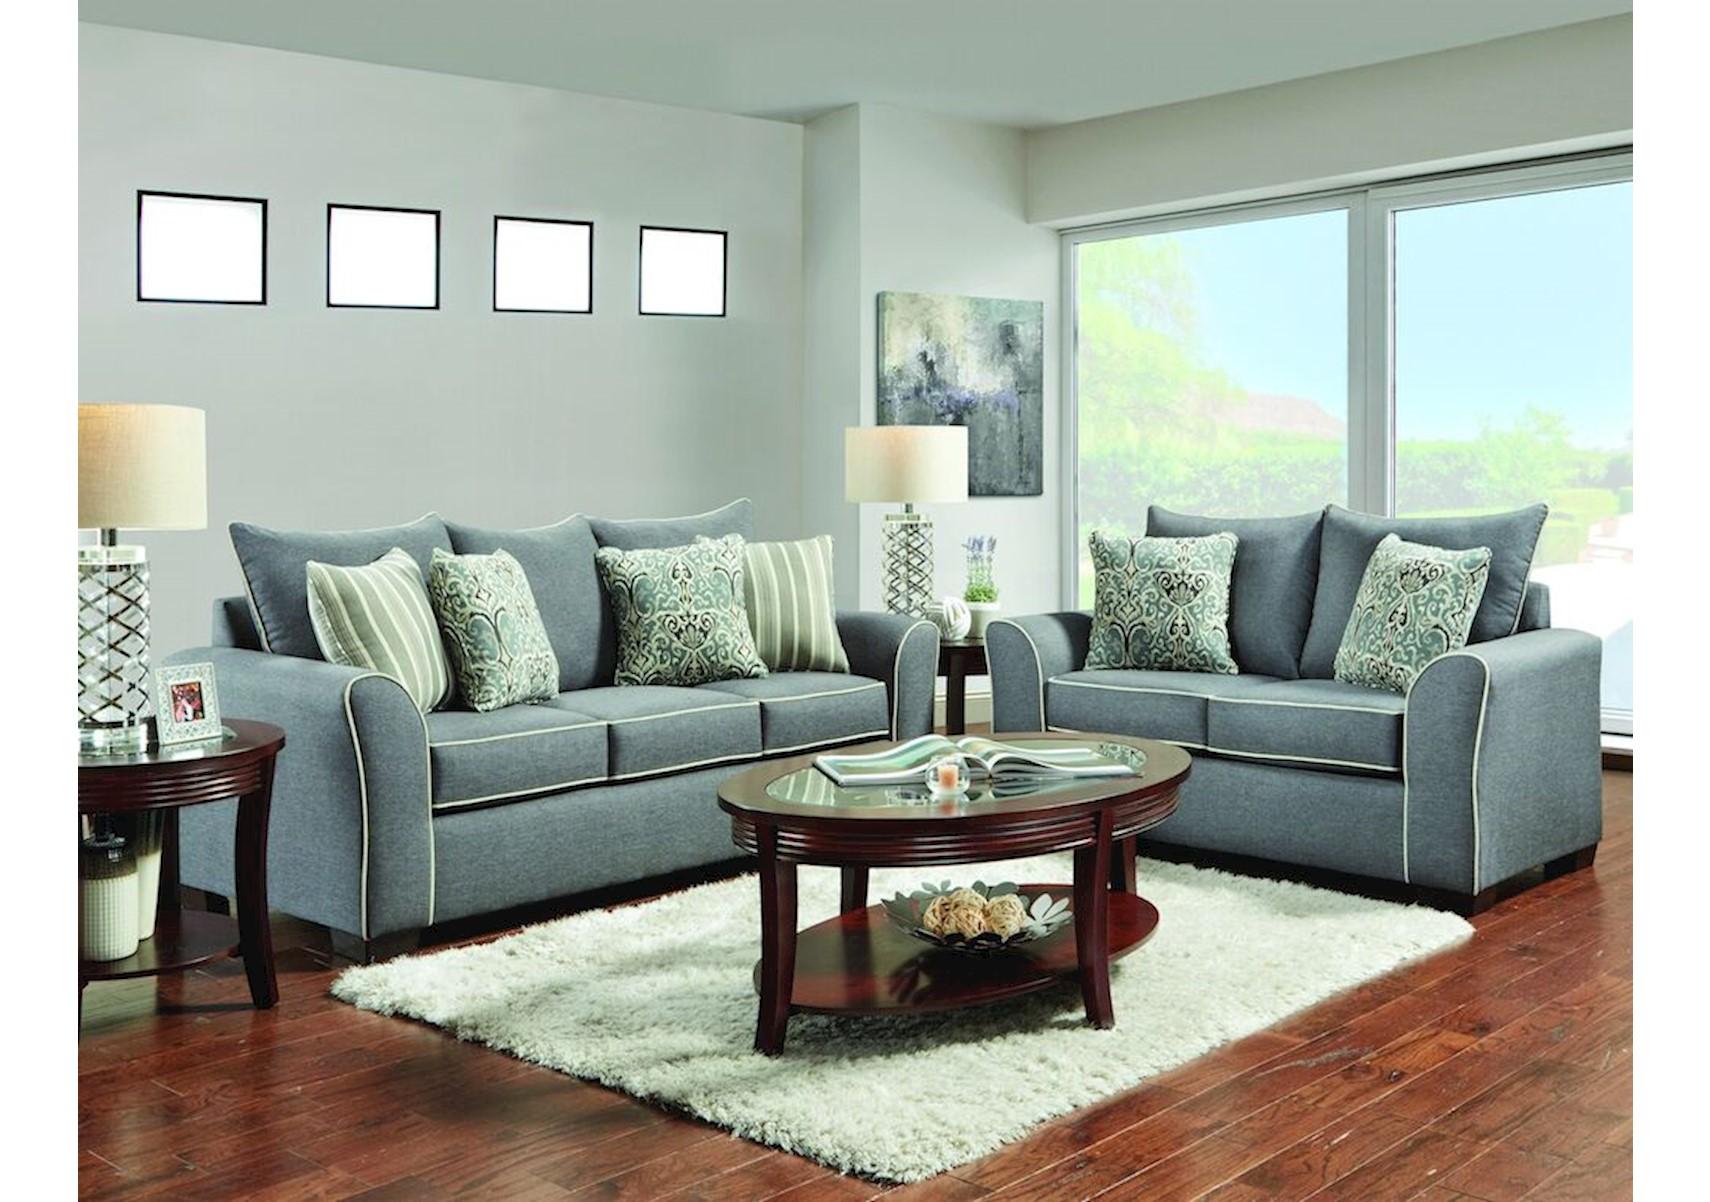 Lacks | Mila Graphite 2-Pc Living Room Set